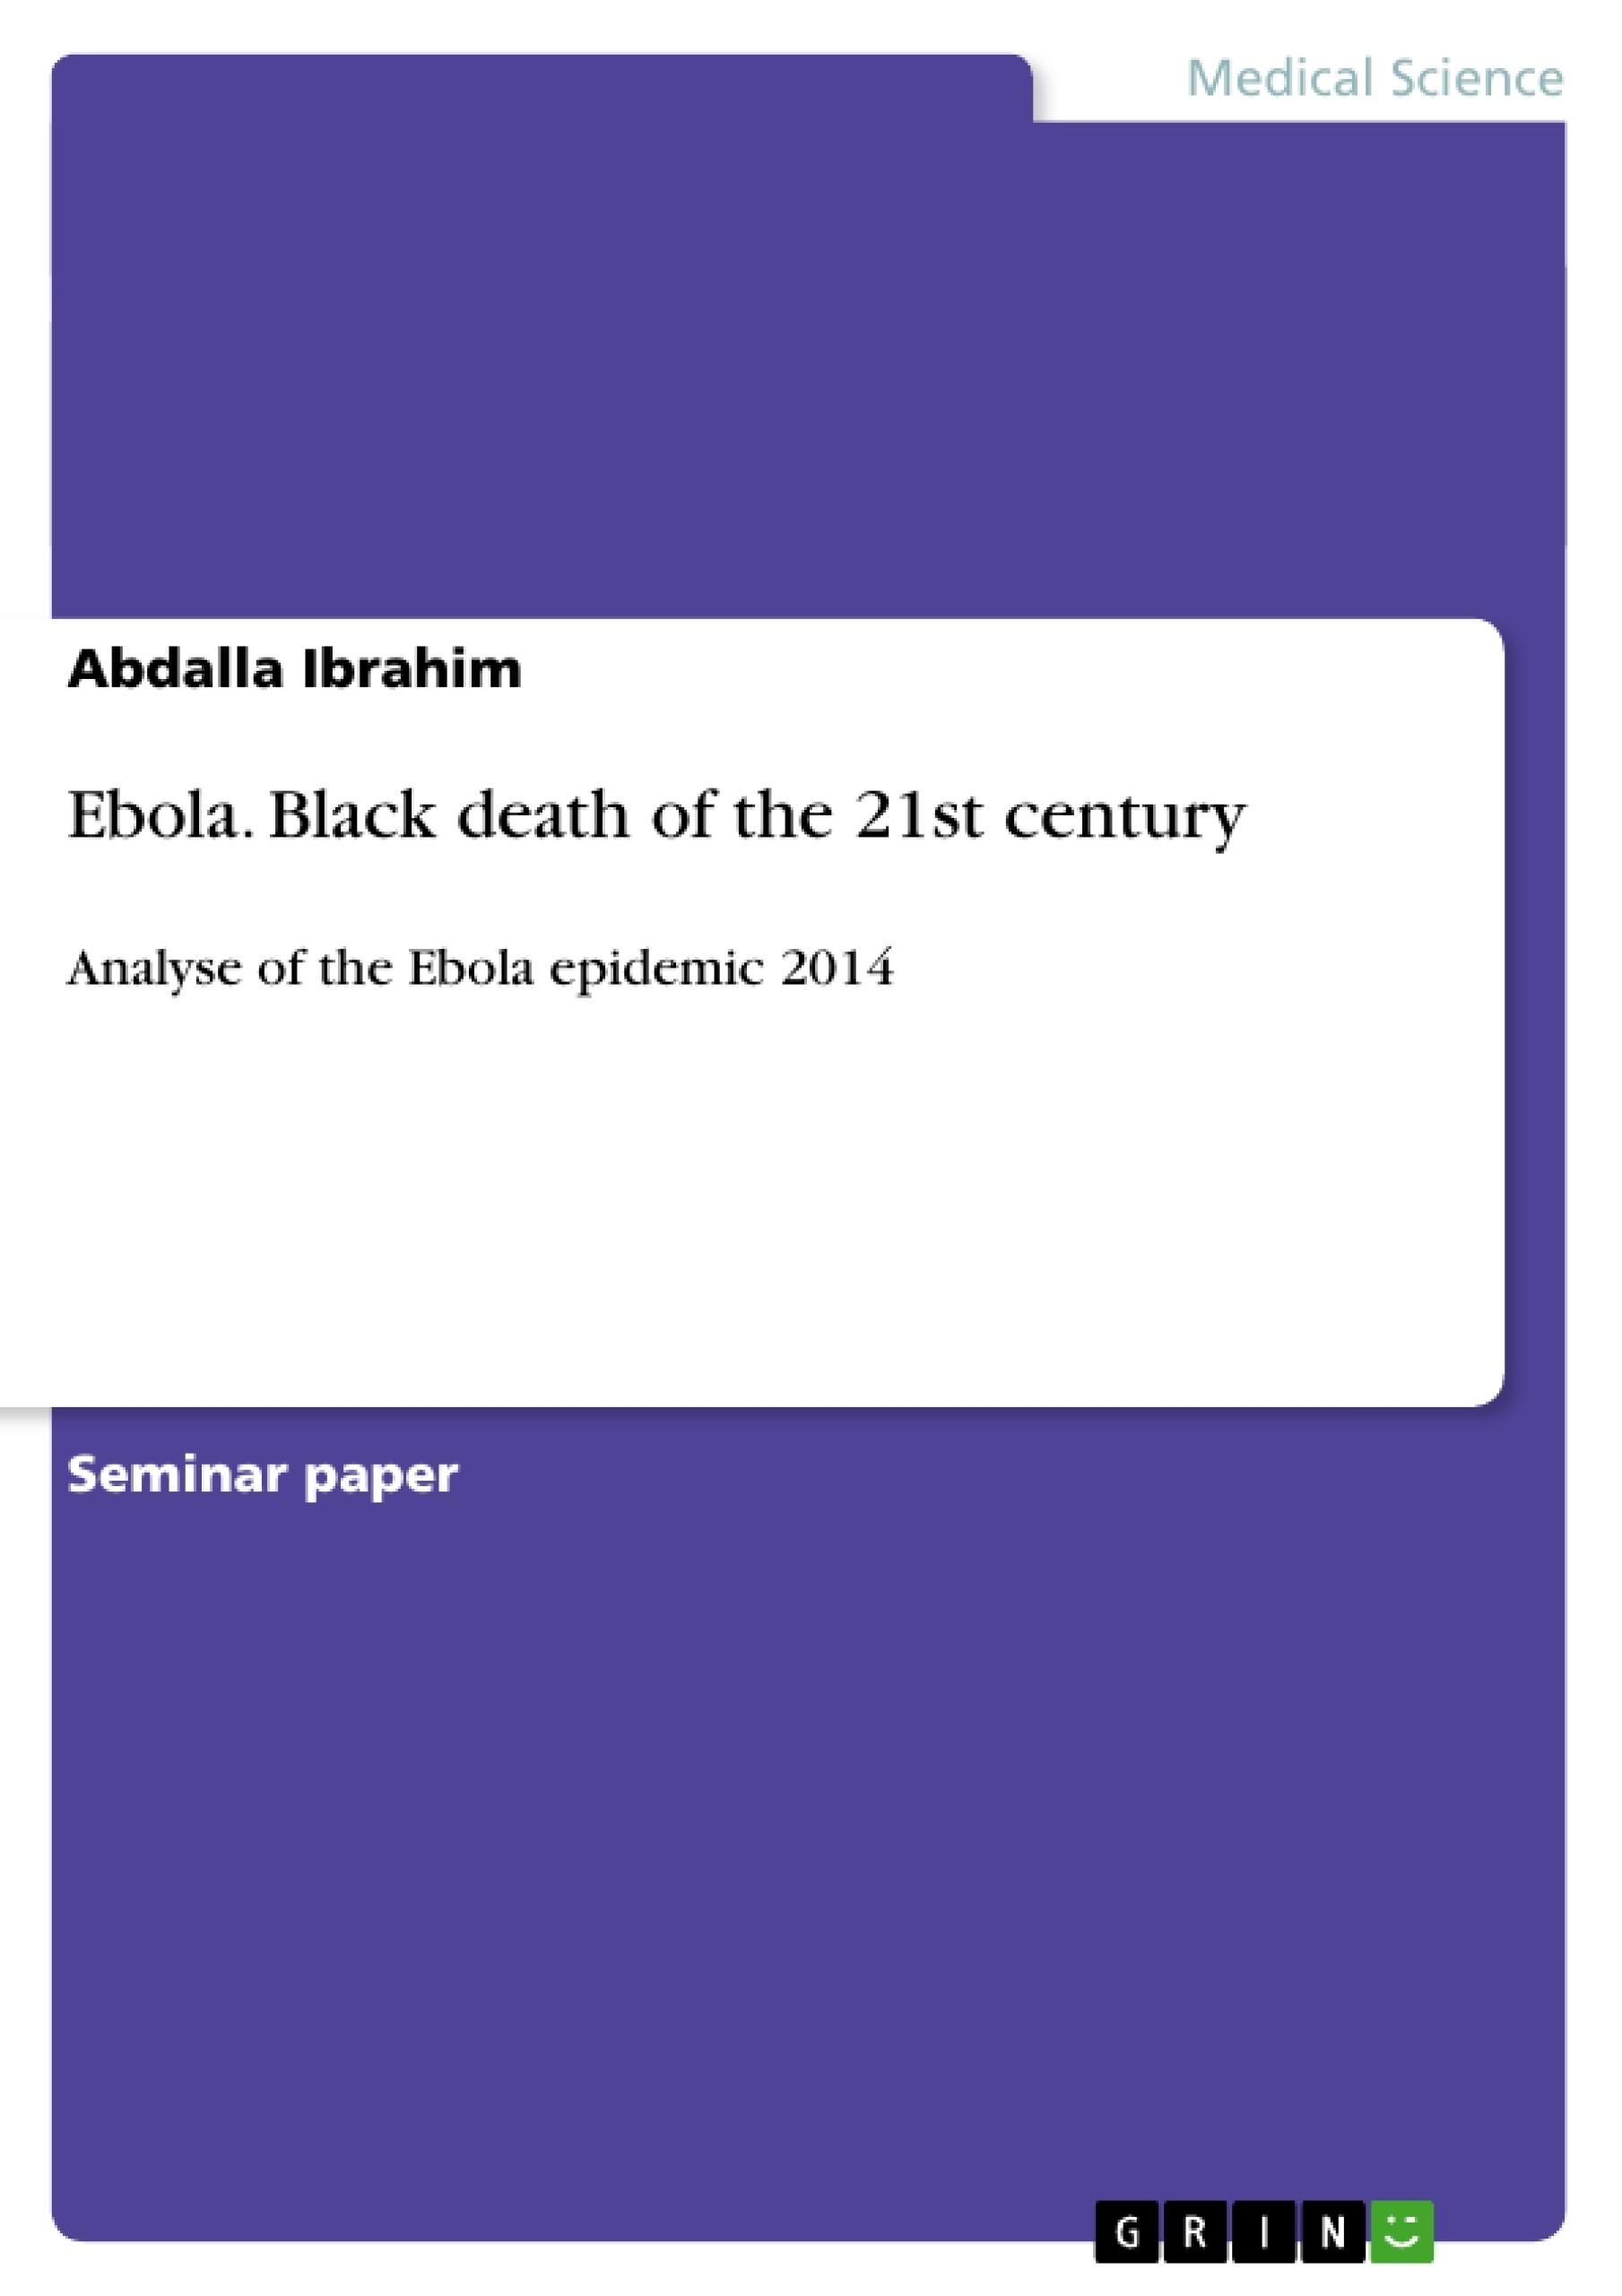 Title: Ebola. Black death of the 21st century